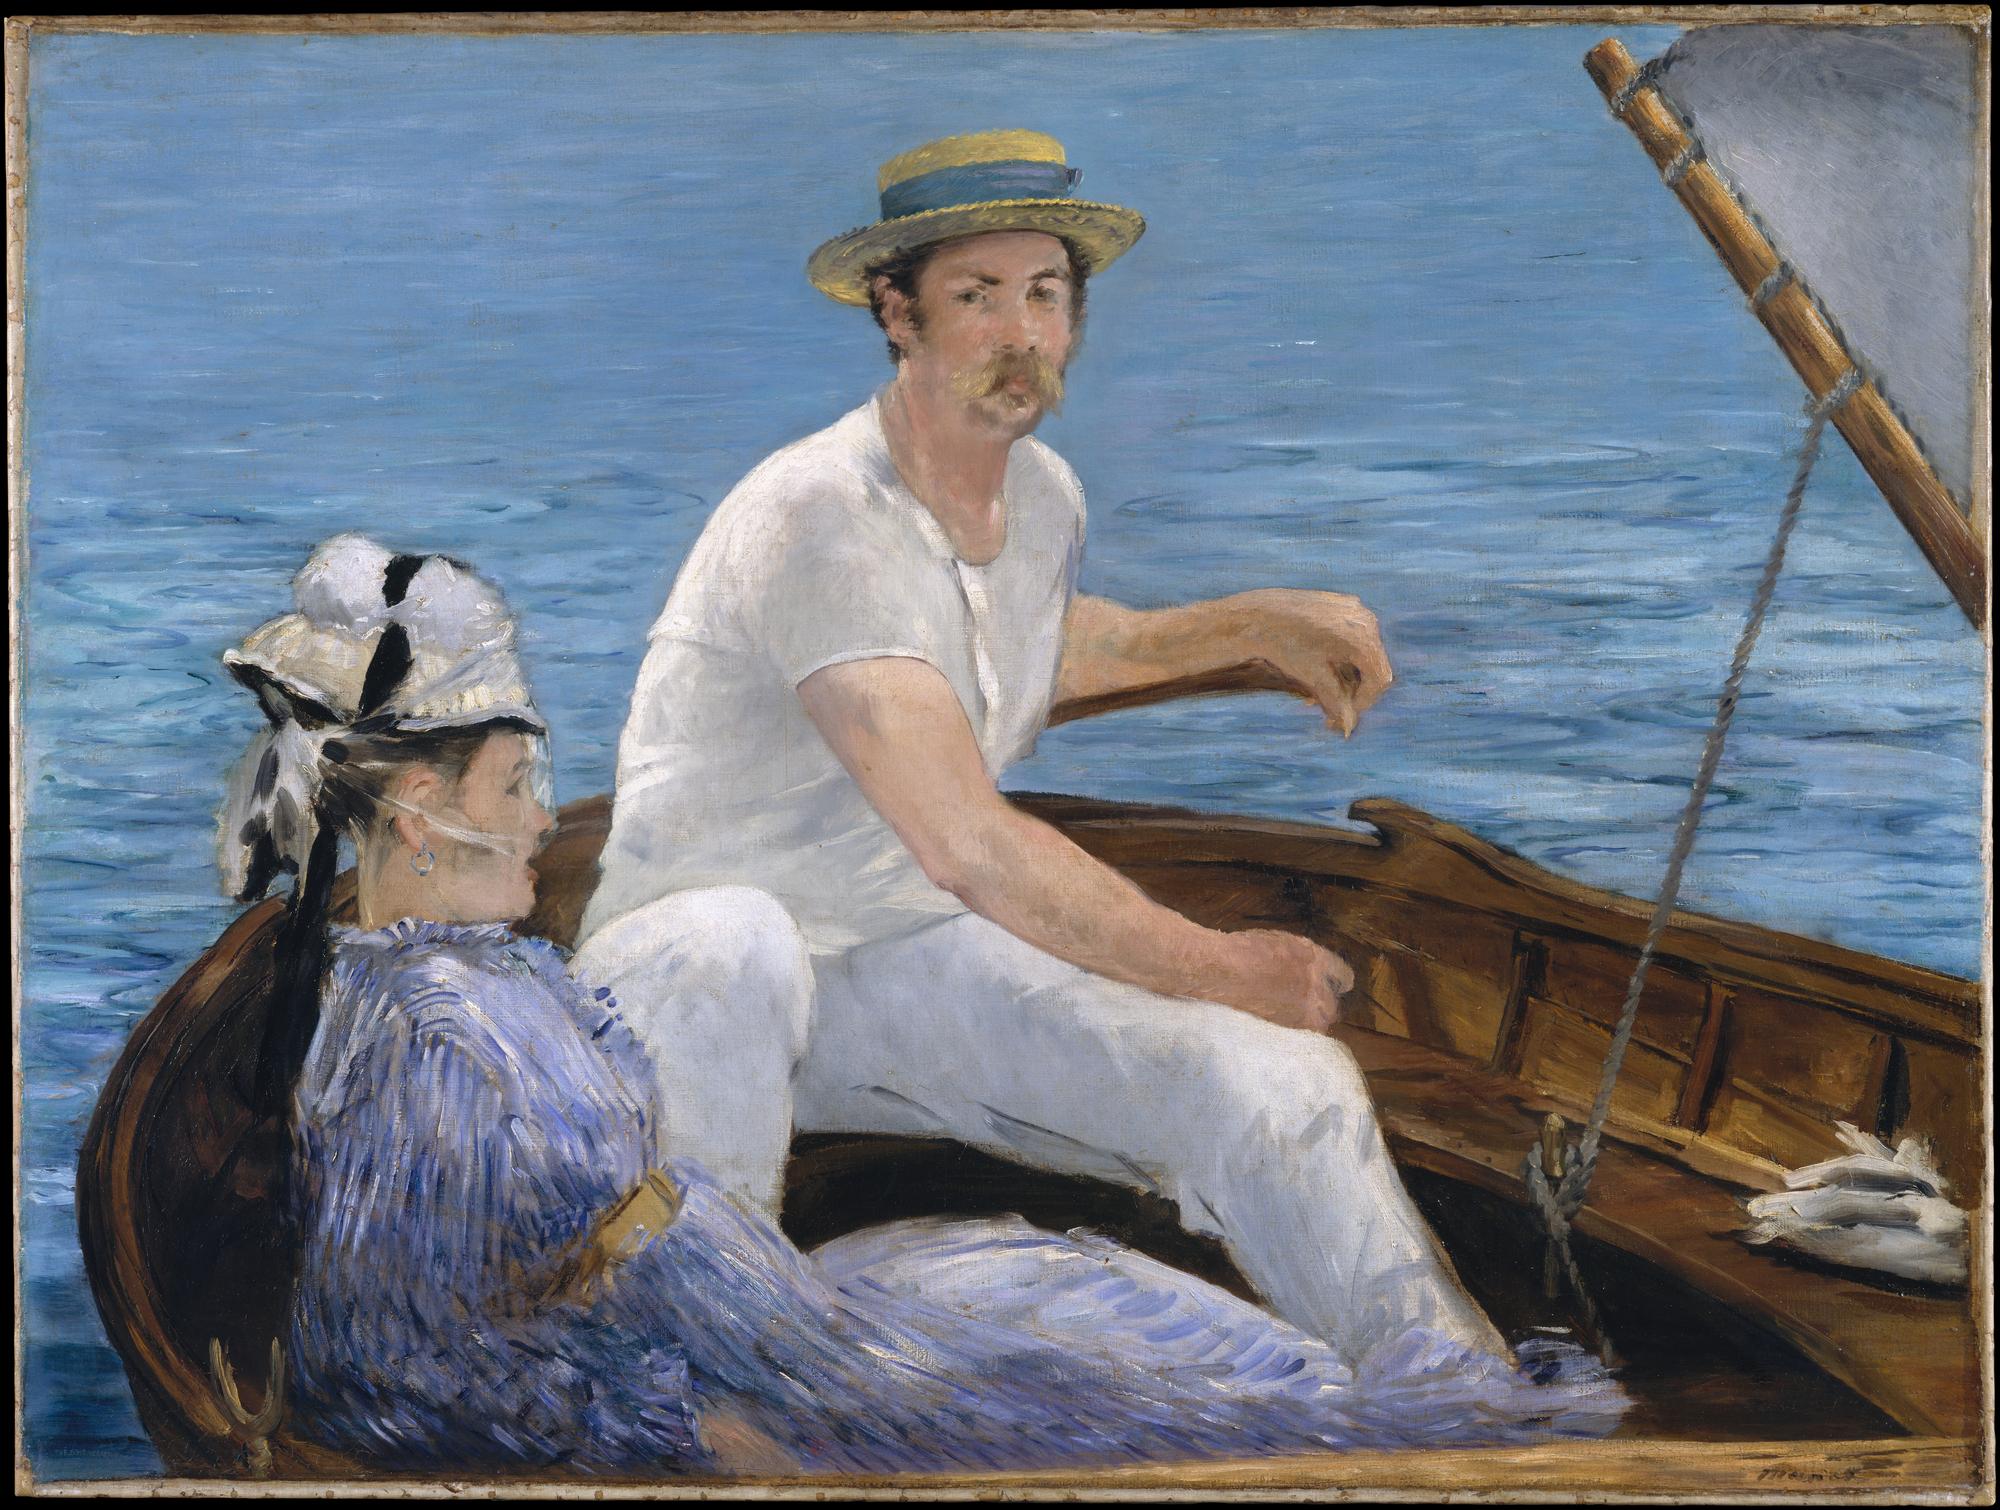 File:Edouard Manet Boating.jpg - Wikimedia Commons